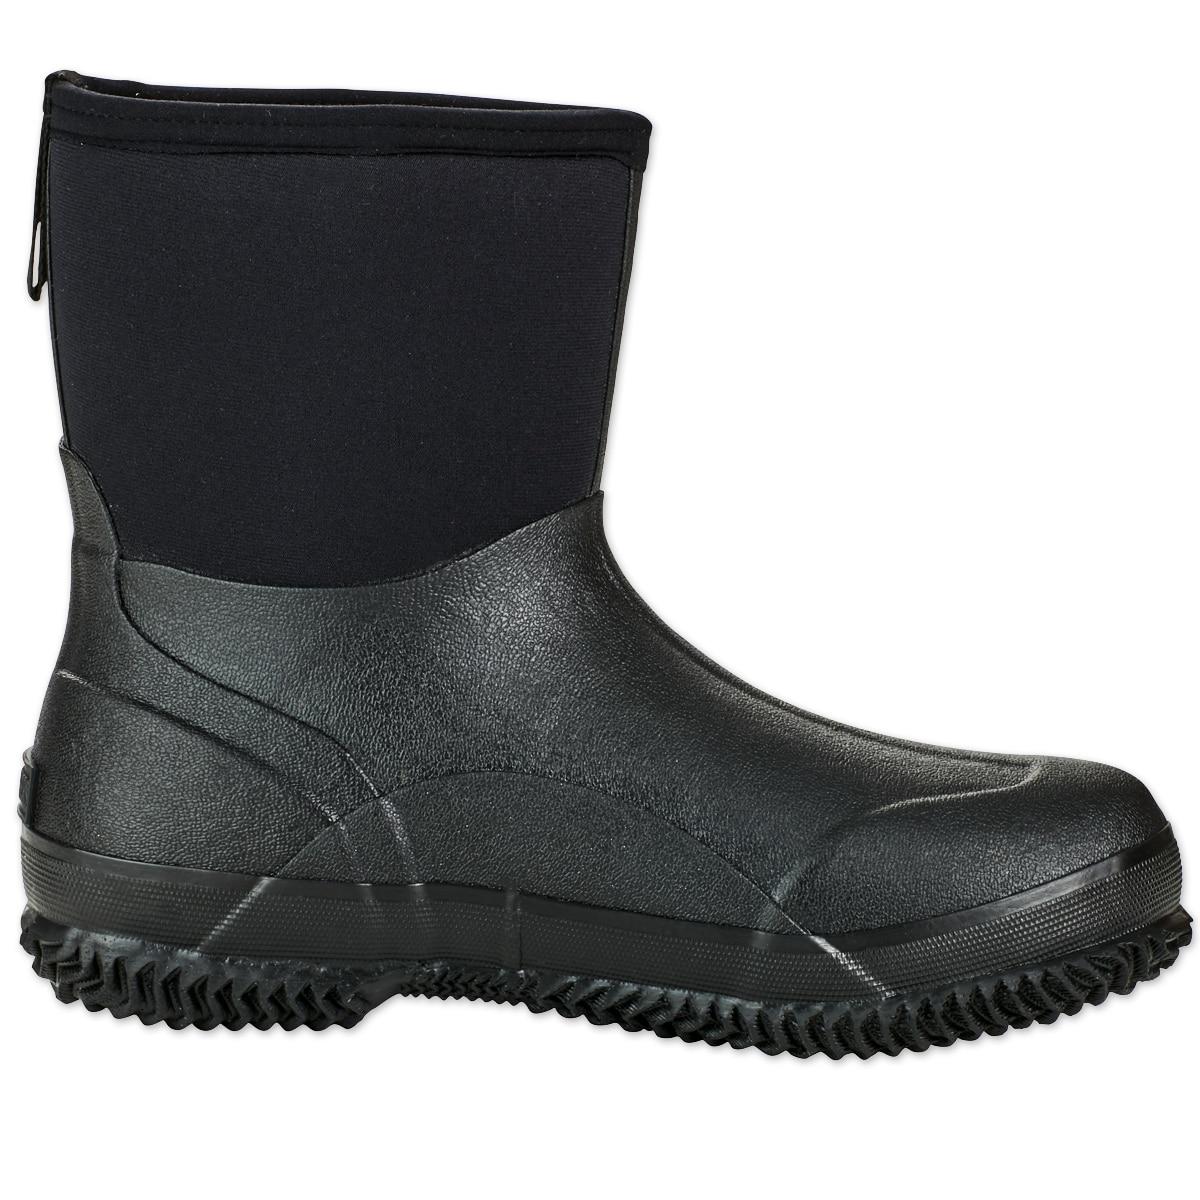 a368e2f950c8 Mudruckers Mid Boots INTEC CORPORATION Equestrian Sports